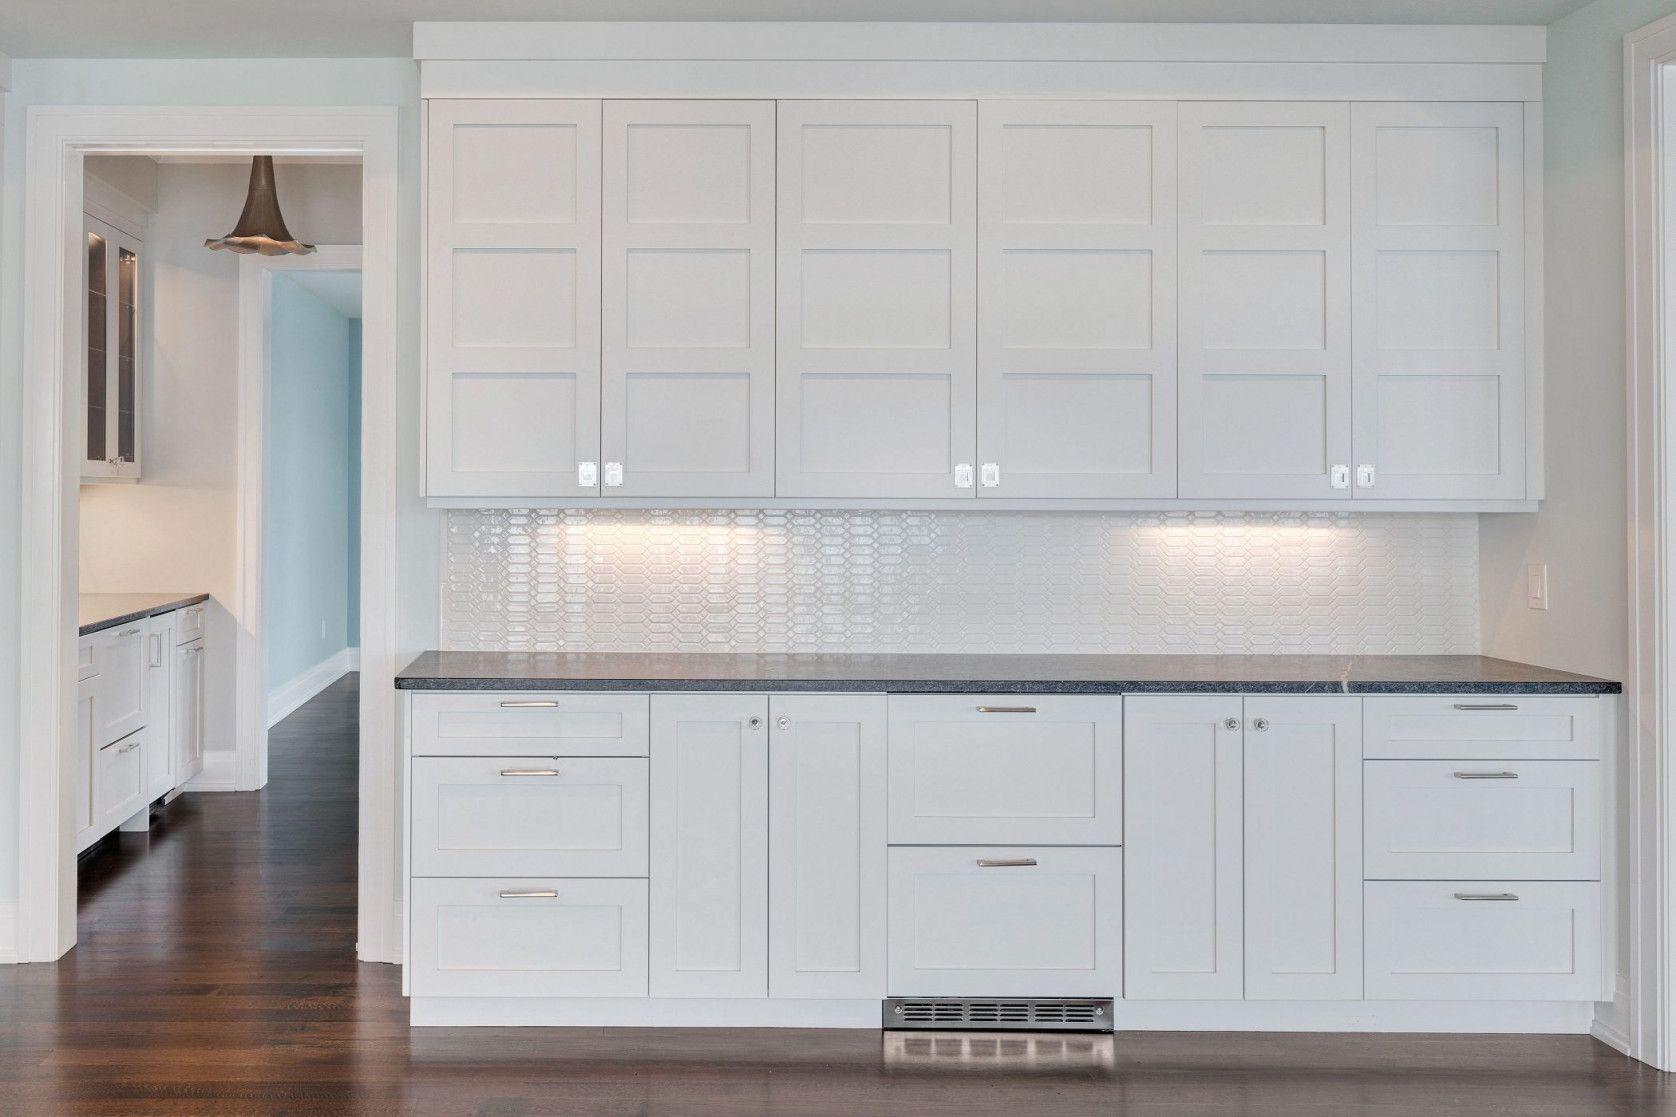 99 Finger Pulls For Kitchen Cabinets Kitchen Decor Theme Ideas Check More At Http Www P Kitchen Cabinets Restoration Hardware Kitchen Transitional Kitchen